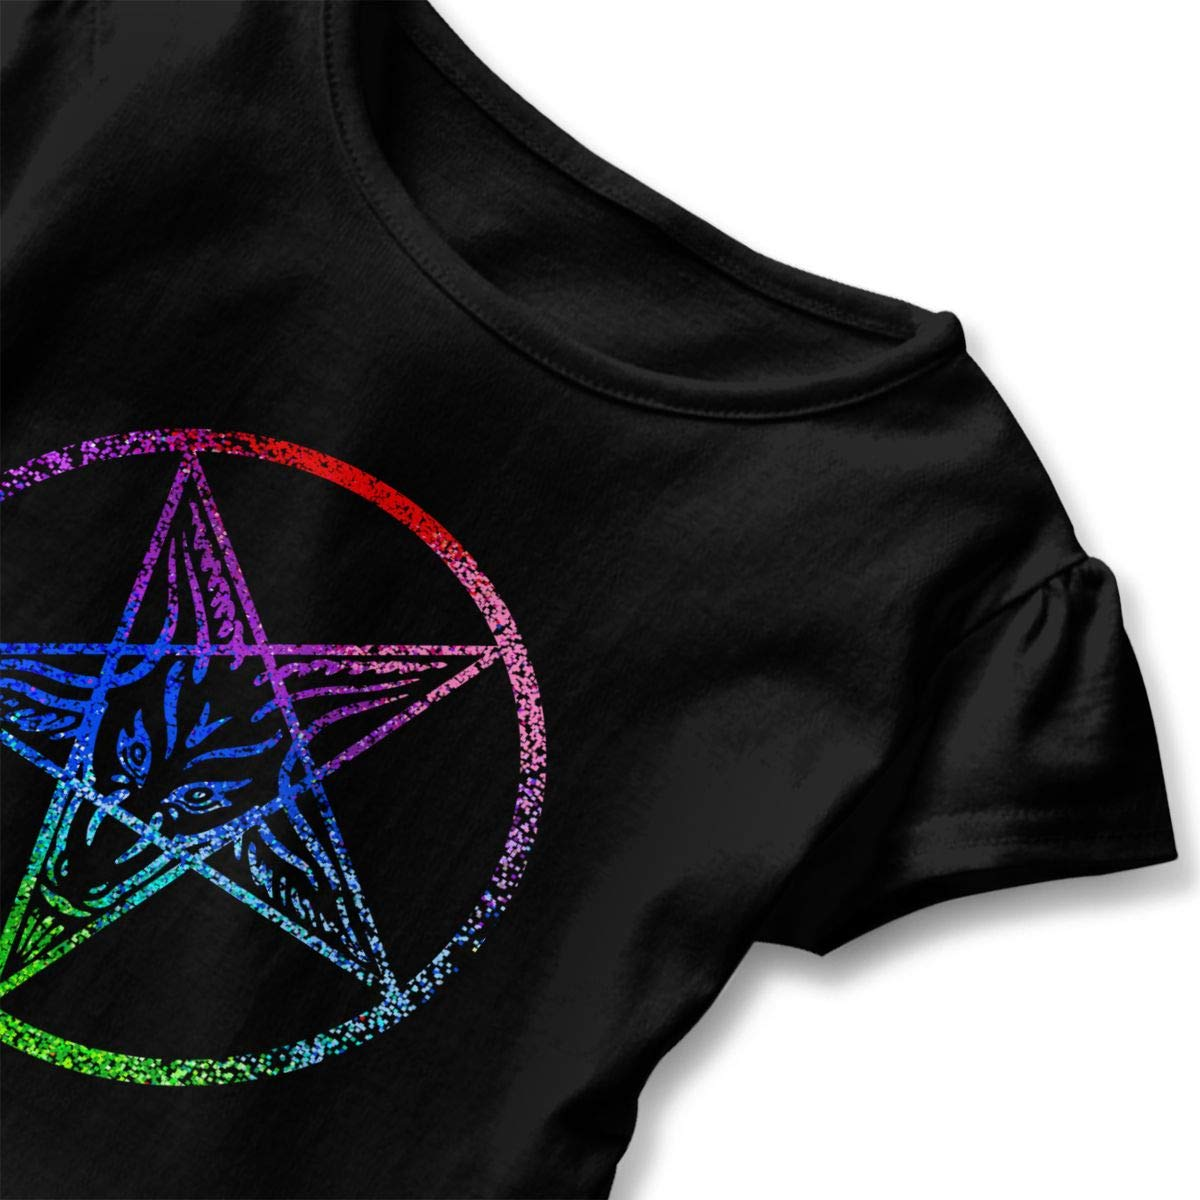 CZnuen Feminist Satanic Pentagram 2-6T Baby Girls Cotton Jersey Short Sleeve Ruffle Tee